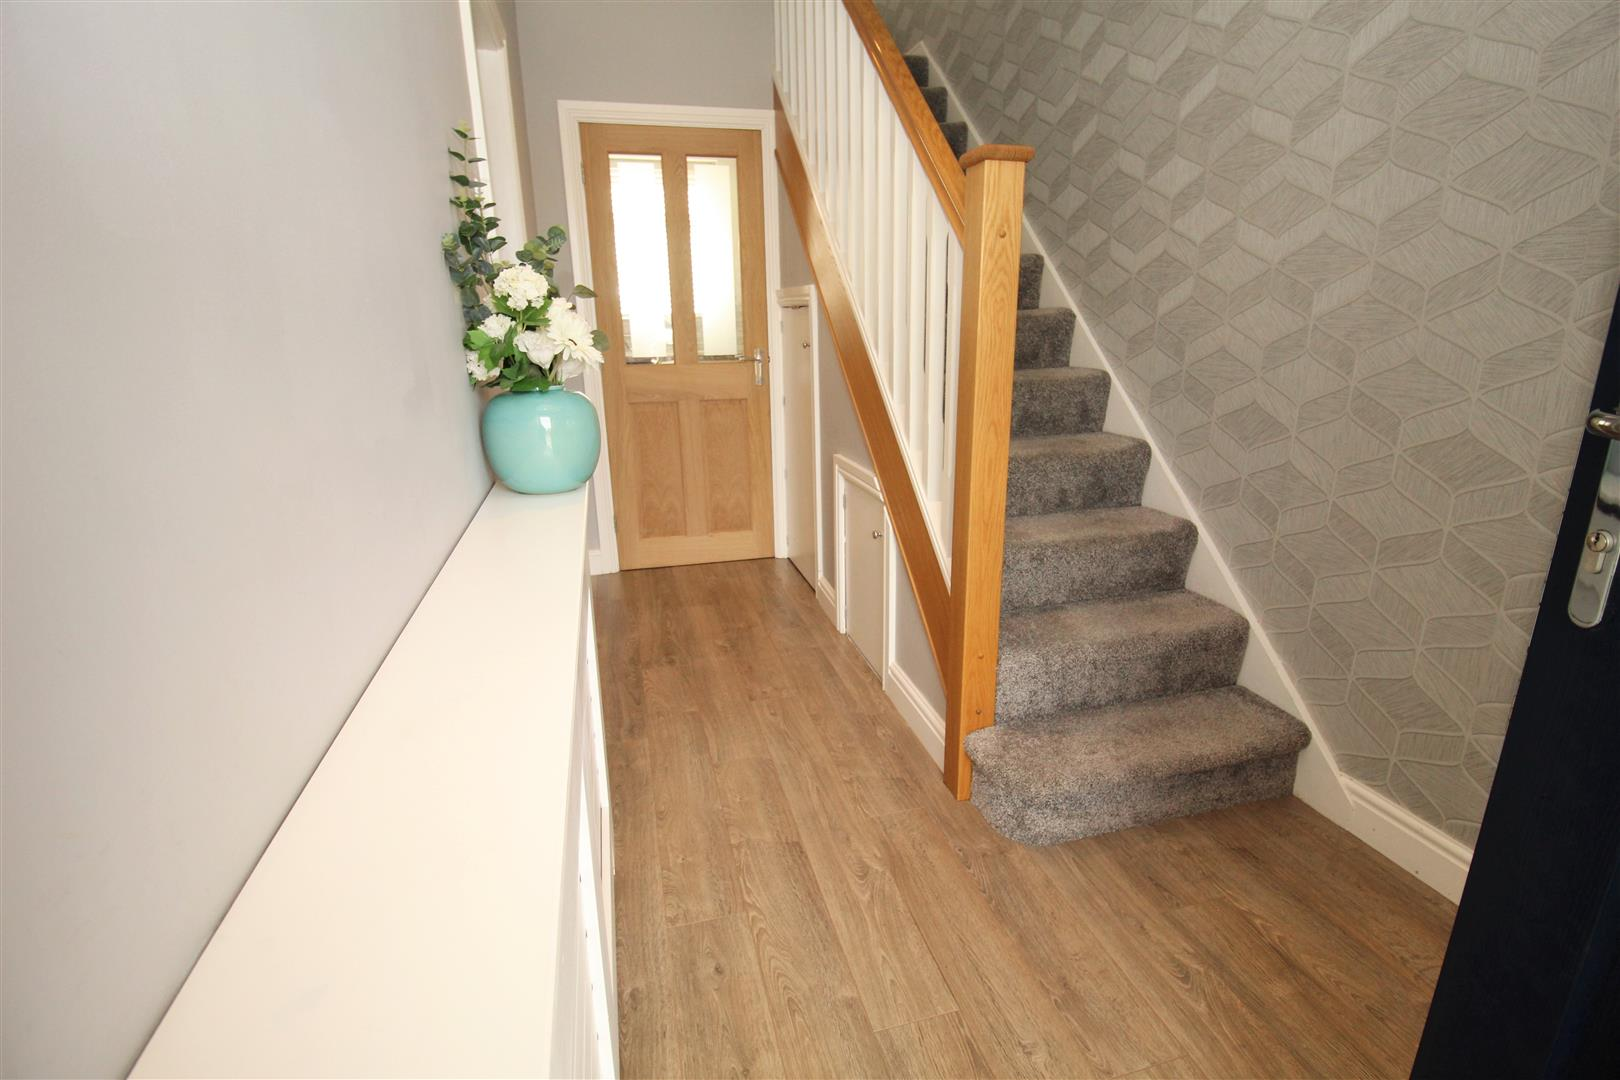 3 Bedrooms, House - Semi-Detached, Liddell Avenue, Melling, Liverpool